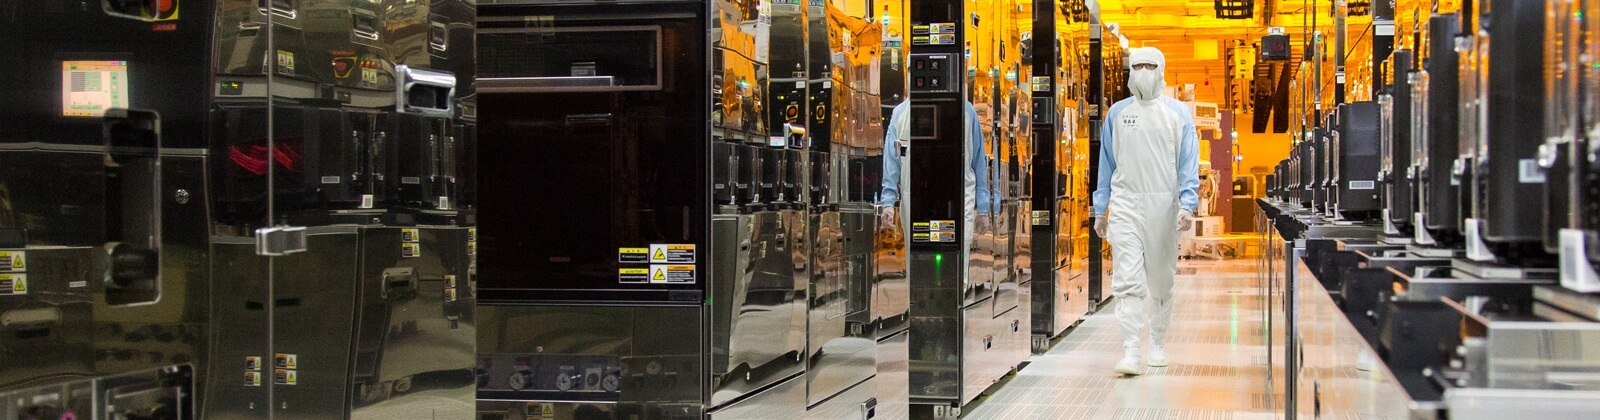 Virtualized Computing